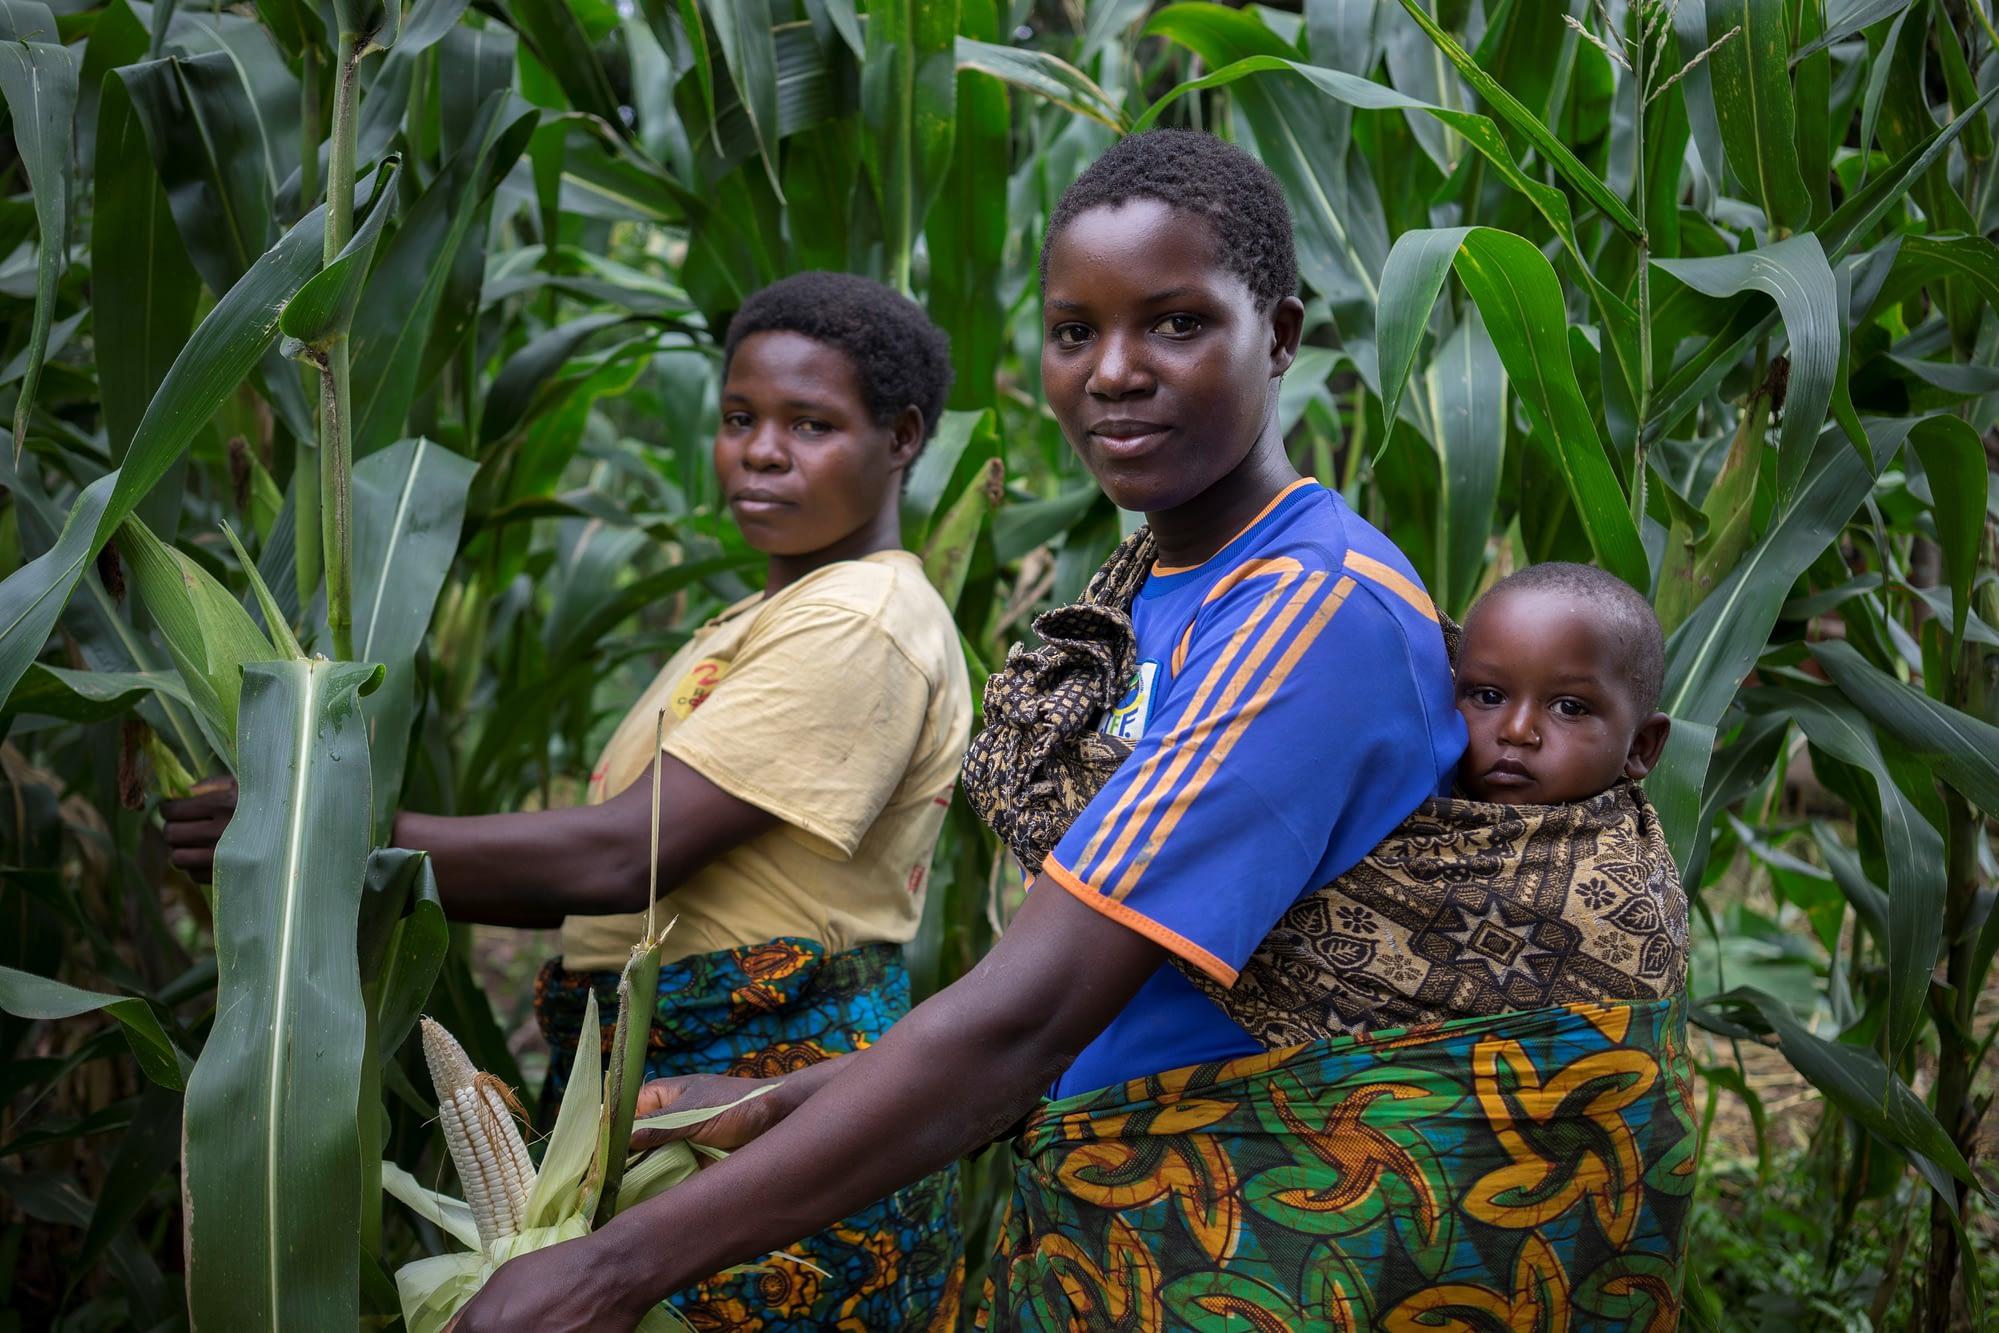 Farmers harvest maize cobs.